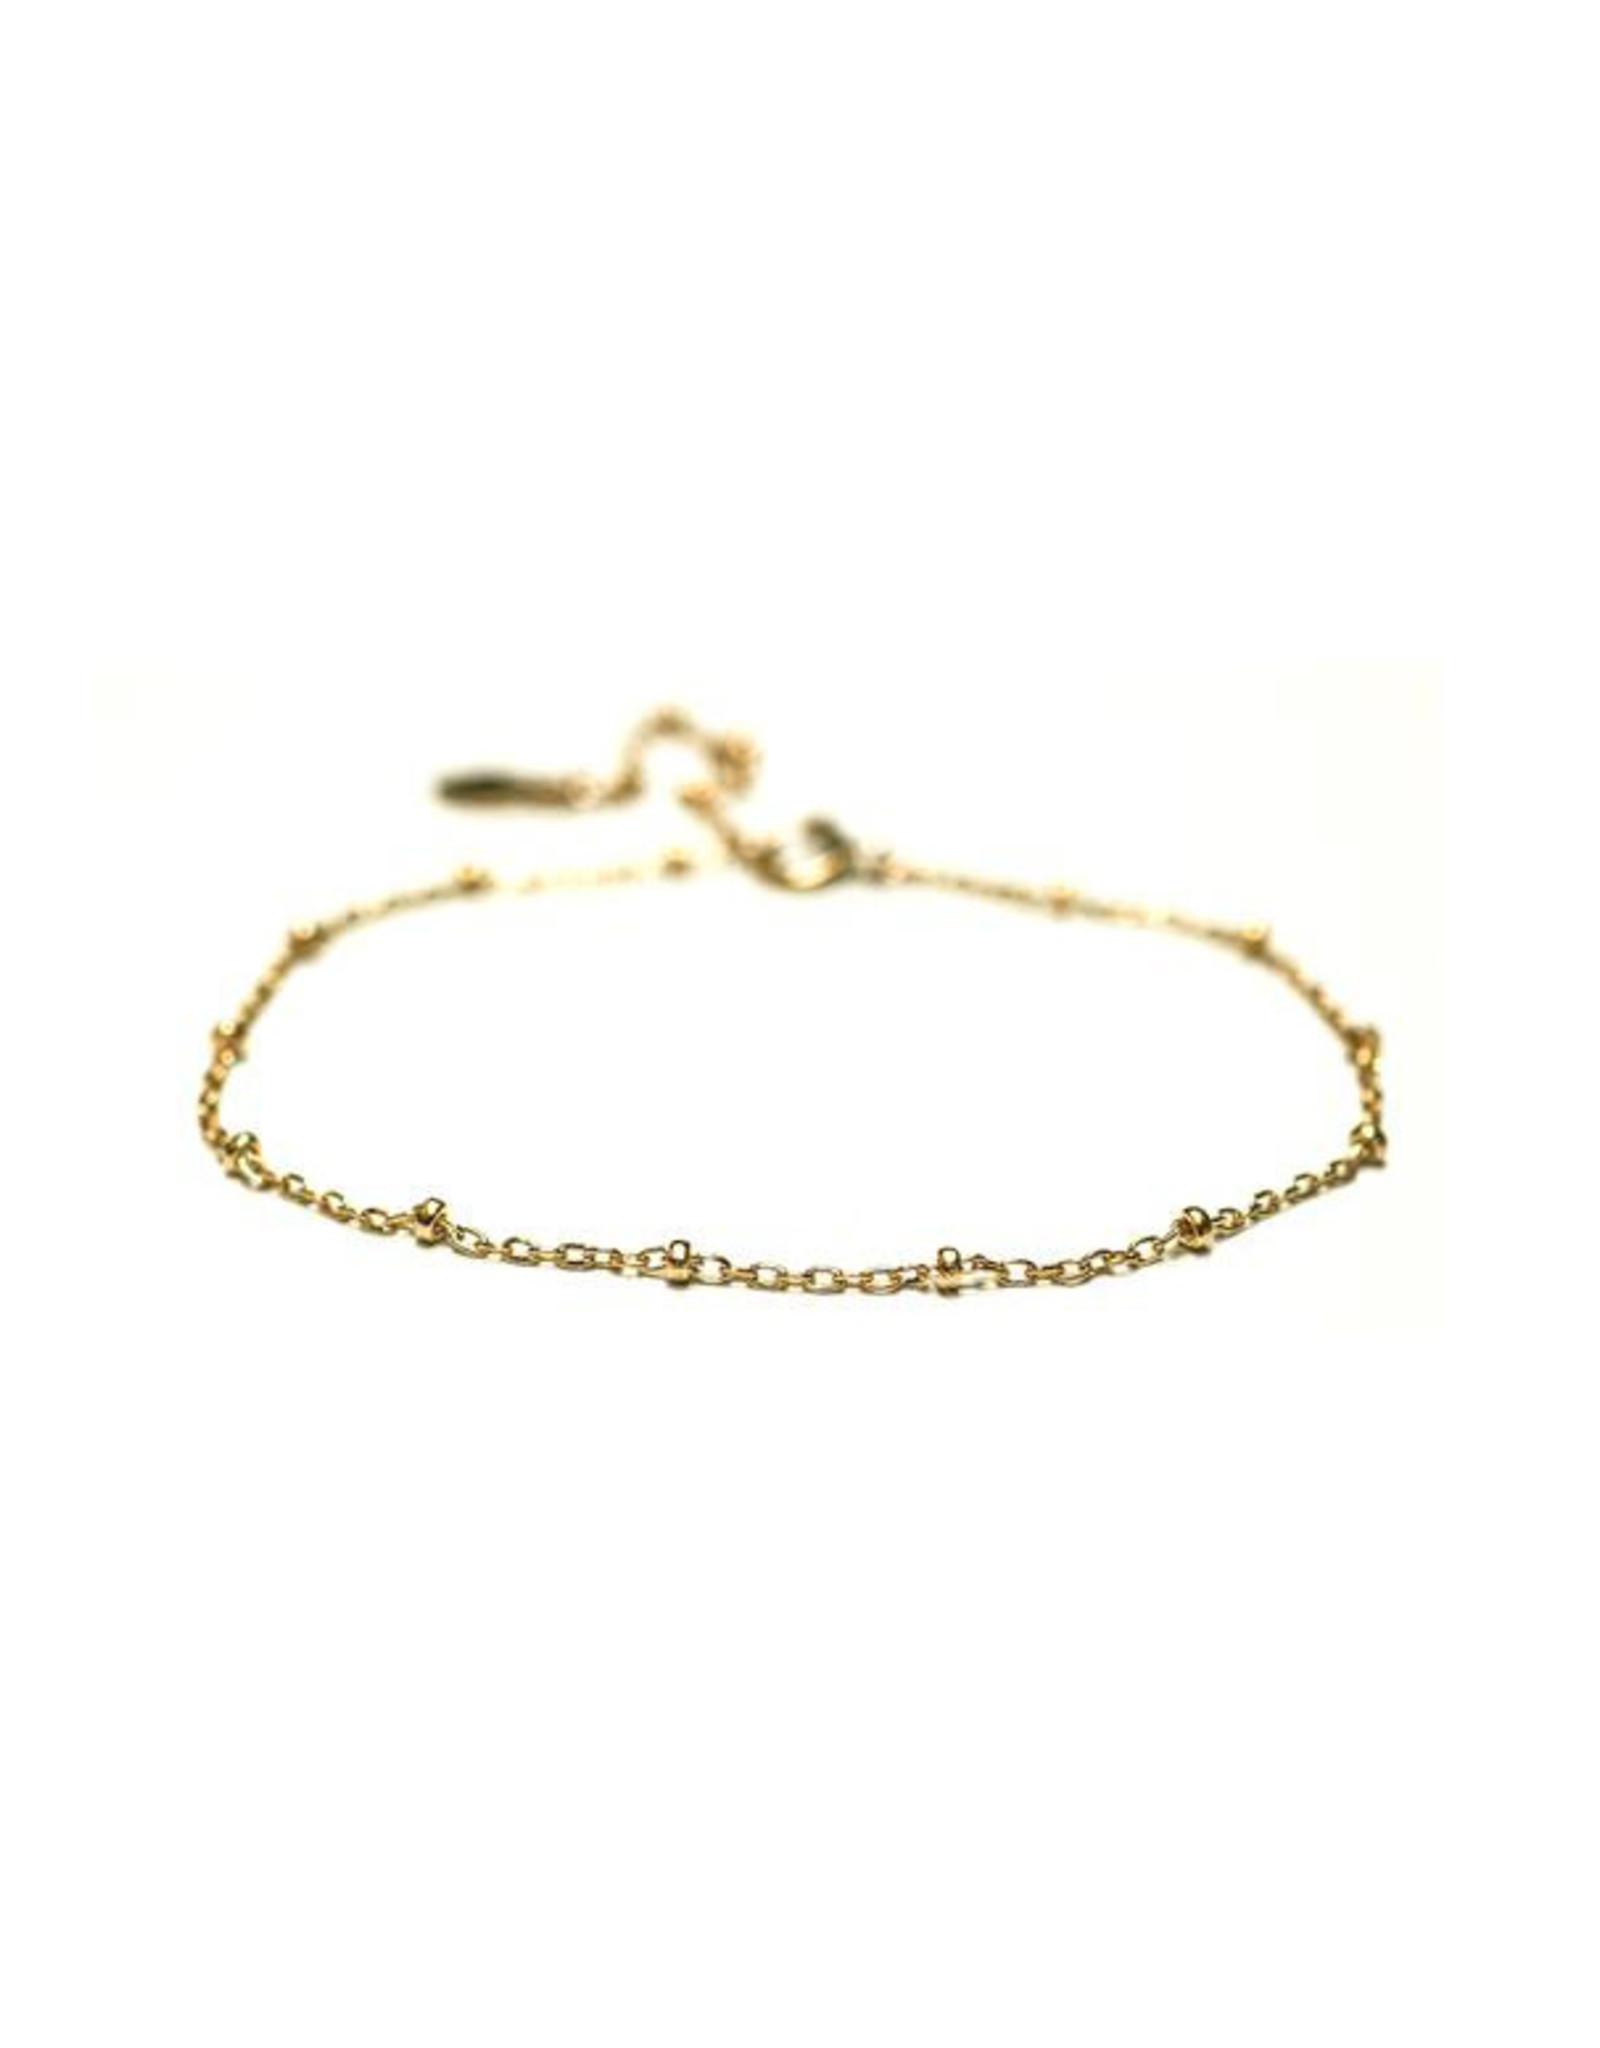 Hart + Stone Dotted Bracelet - Gold Fill